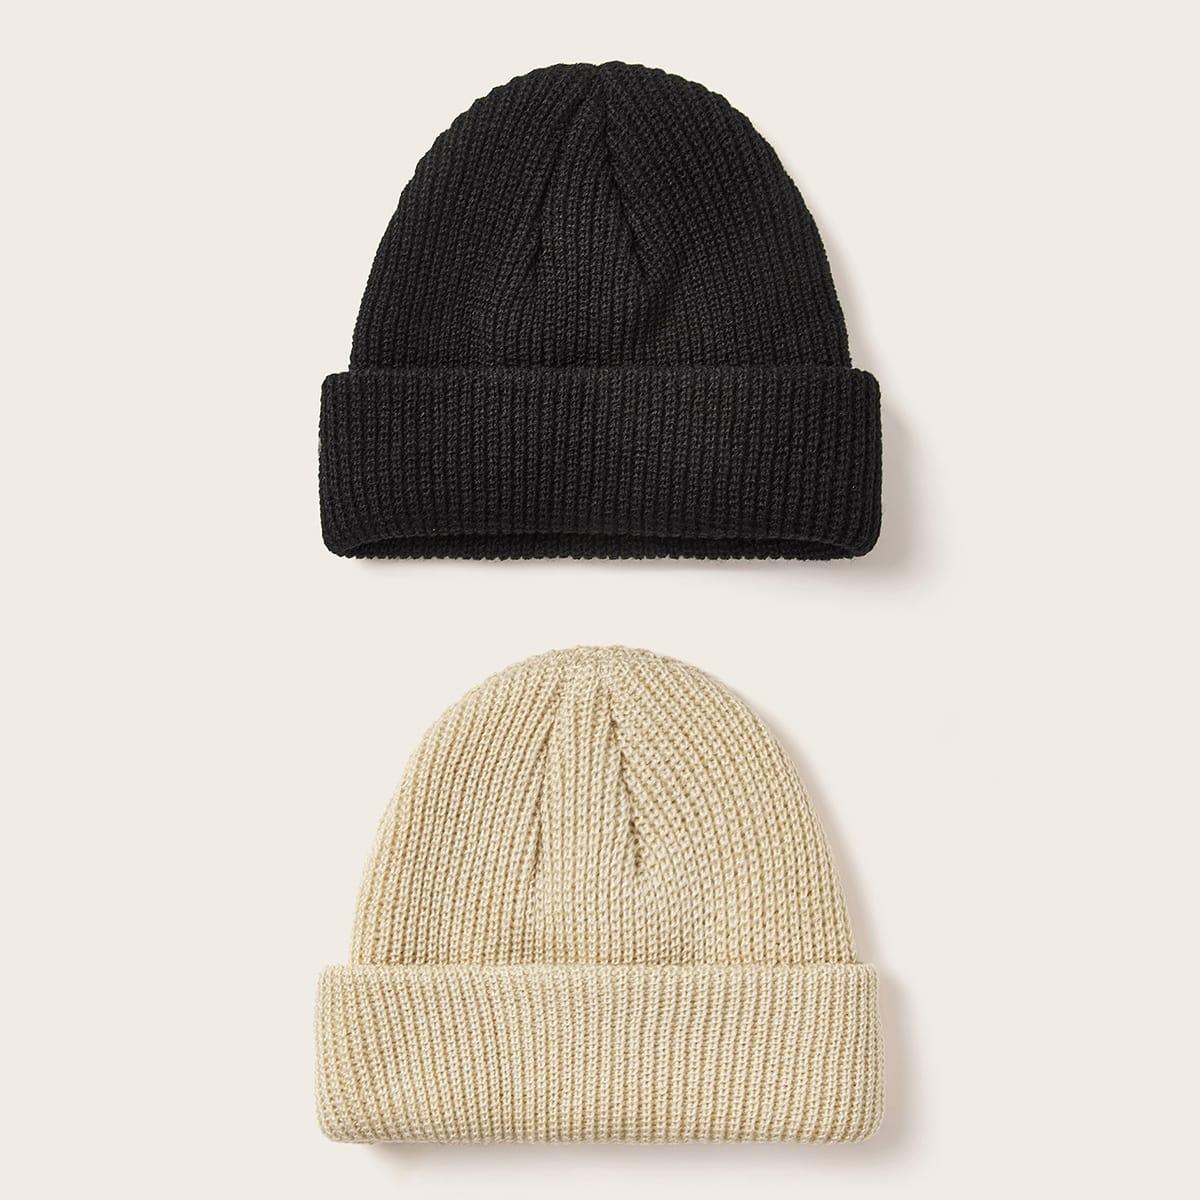 Однотонная вязаная шапка 2шт от SHEIN